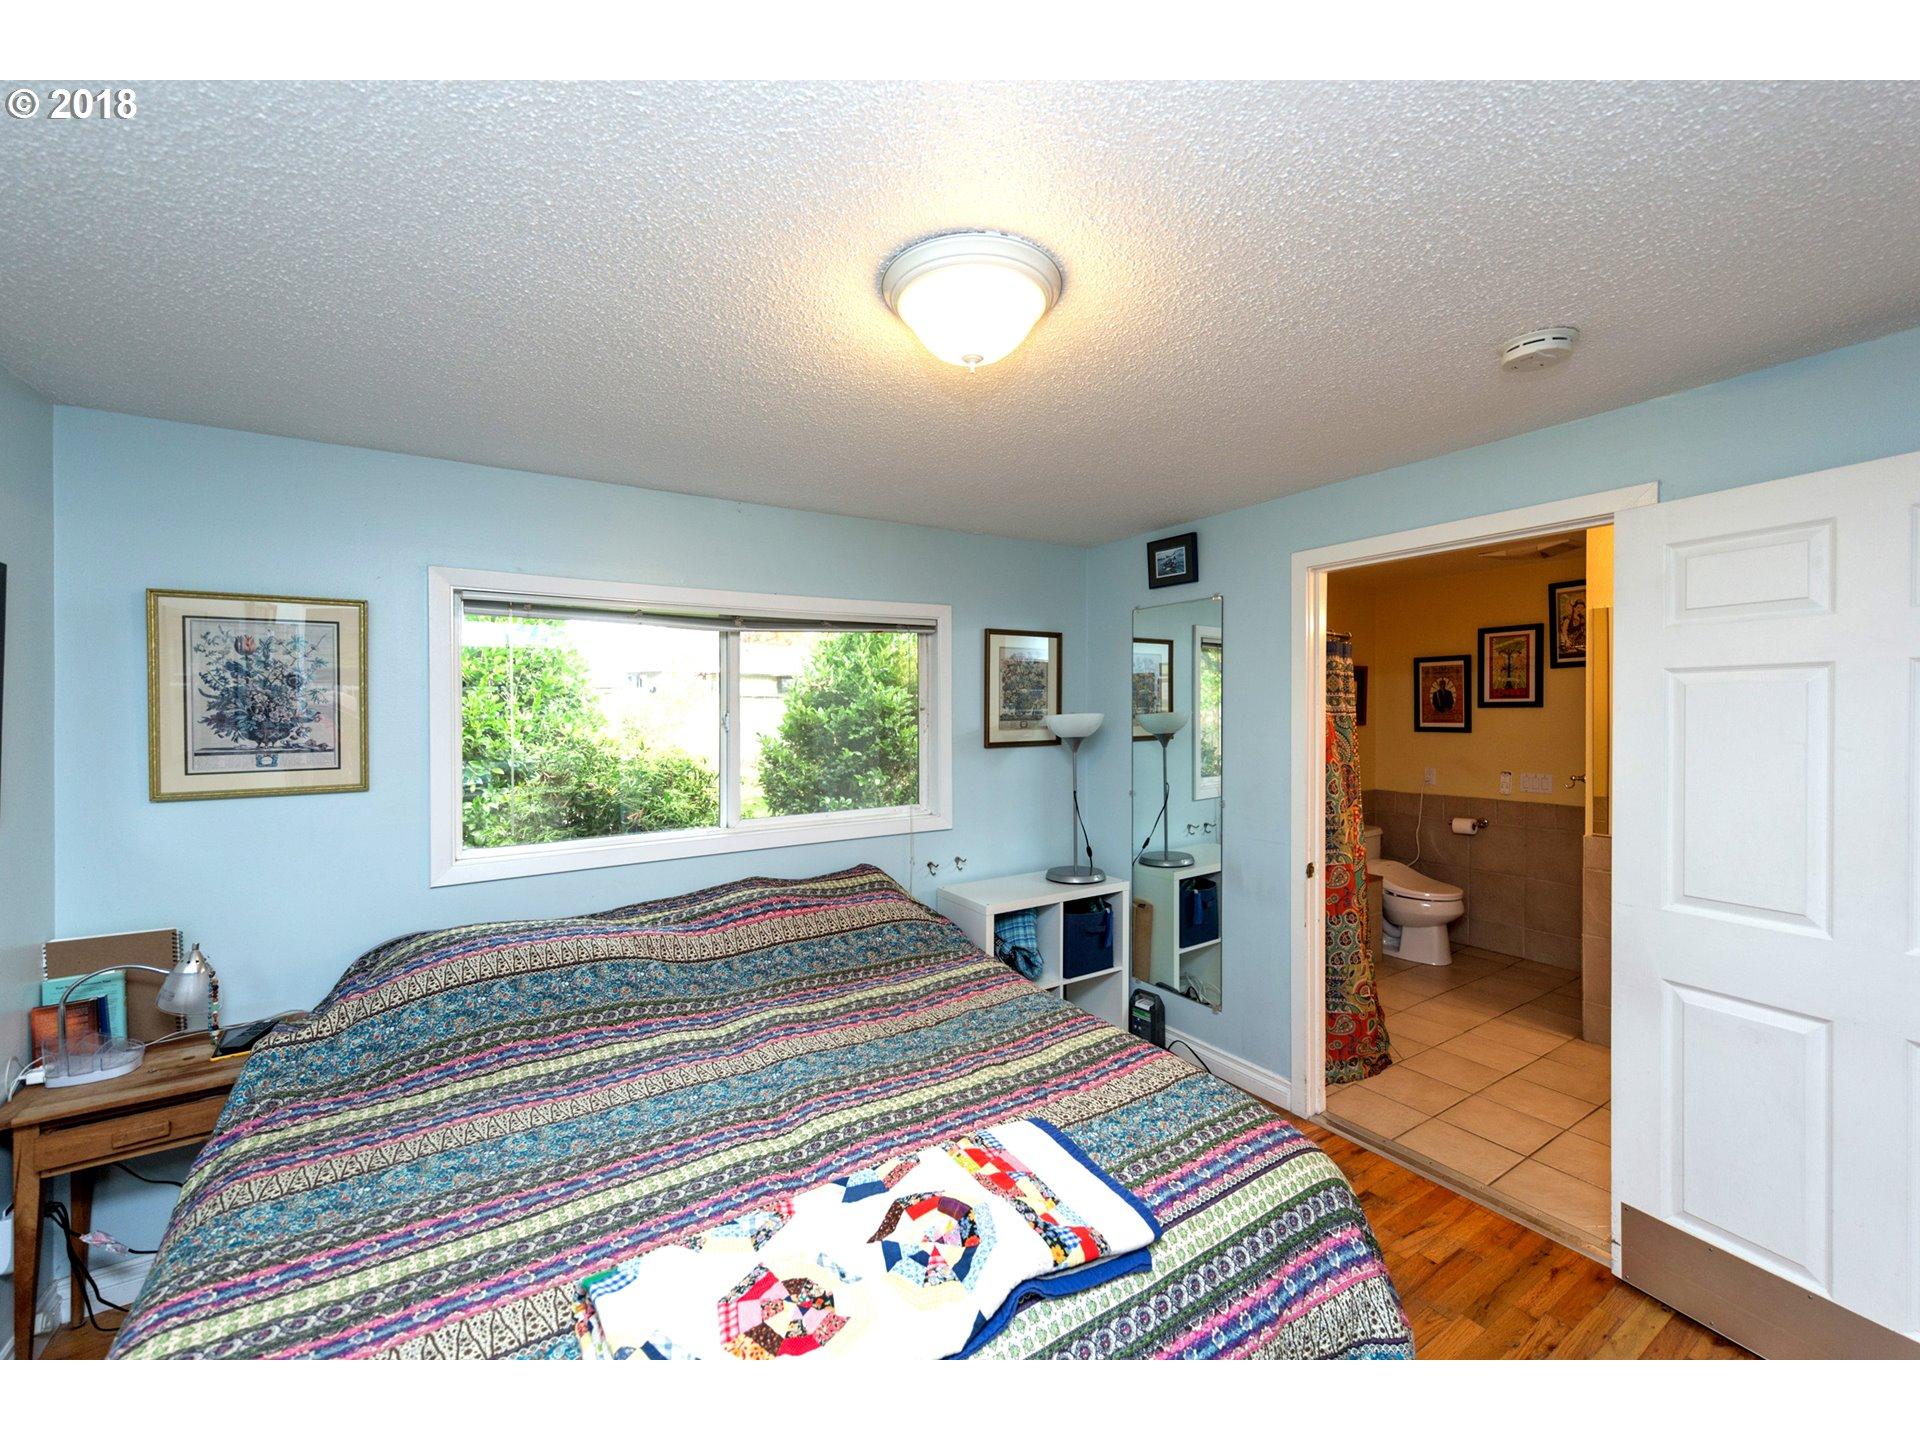 850 SW 134TH AVE Beaverton, OR 97005 - MLS #: 18426219